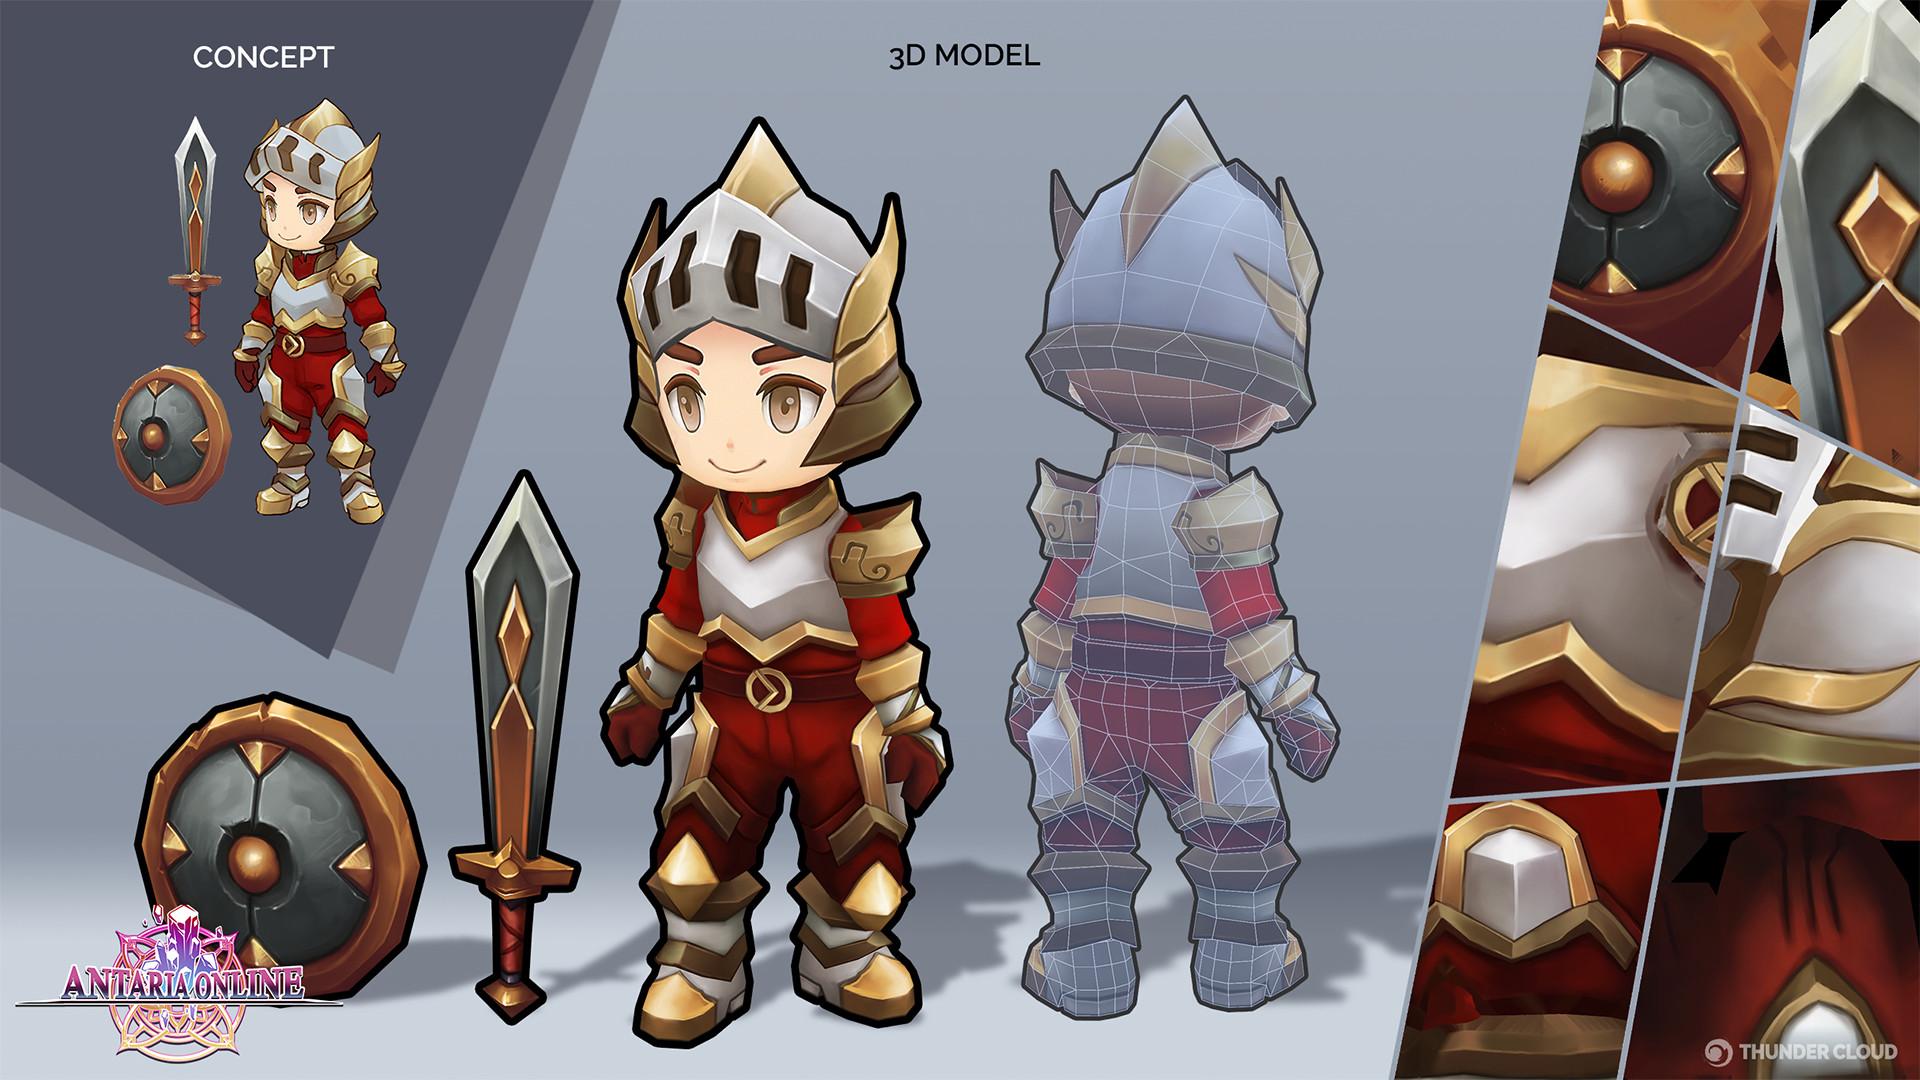 Thunder cloud 04 armor3 min deli